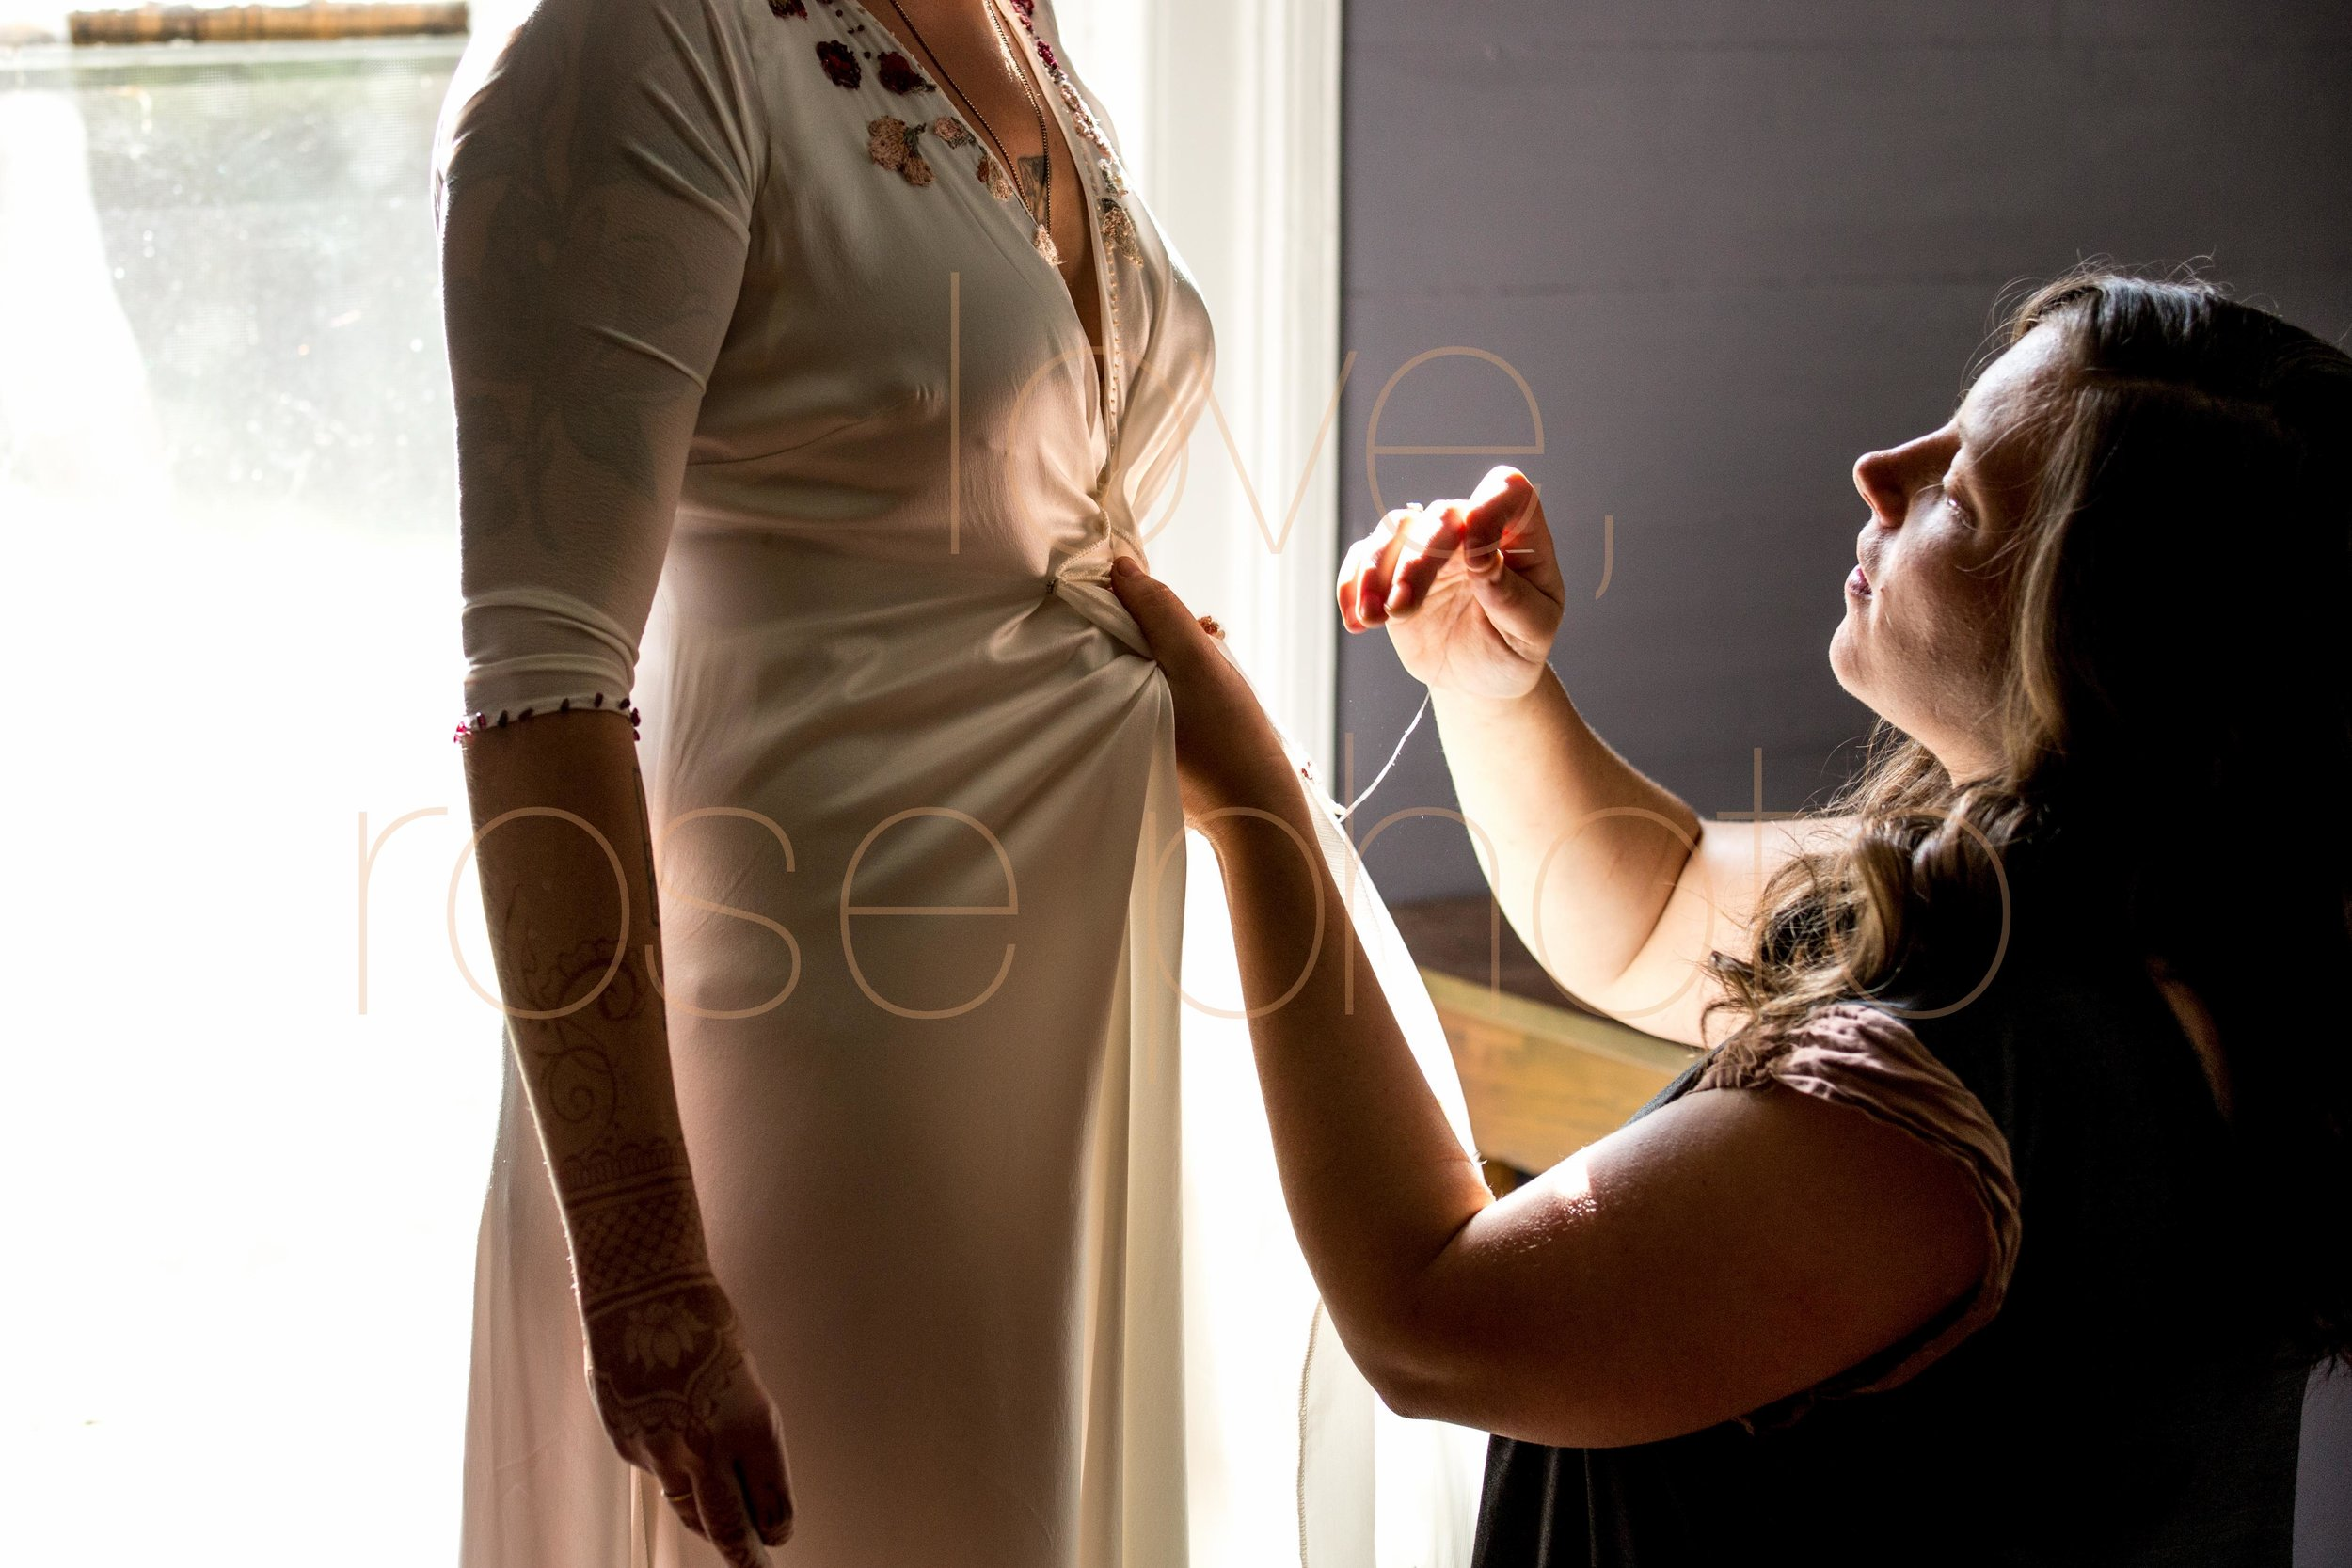 Jane Krame + Jason Ashevegas married asheville best wedding photographers -18.jpg